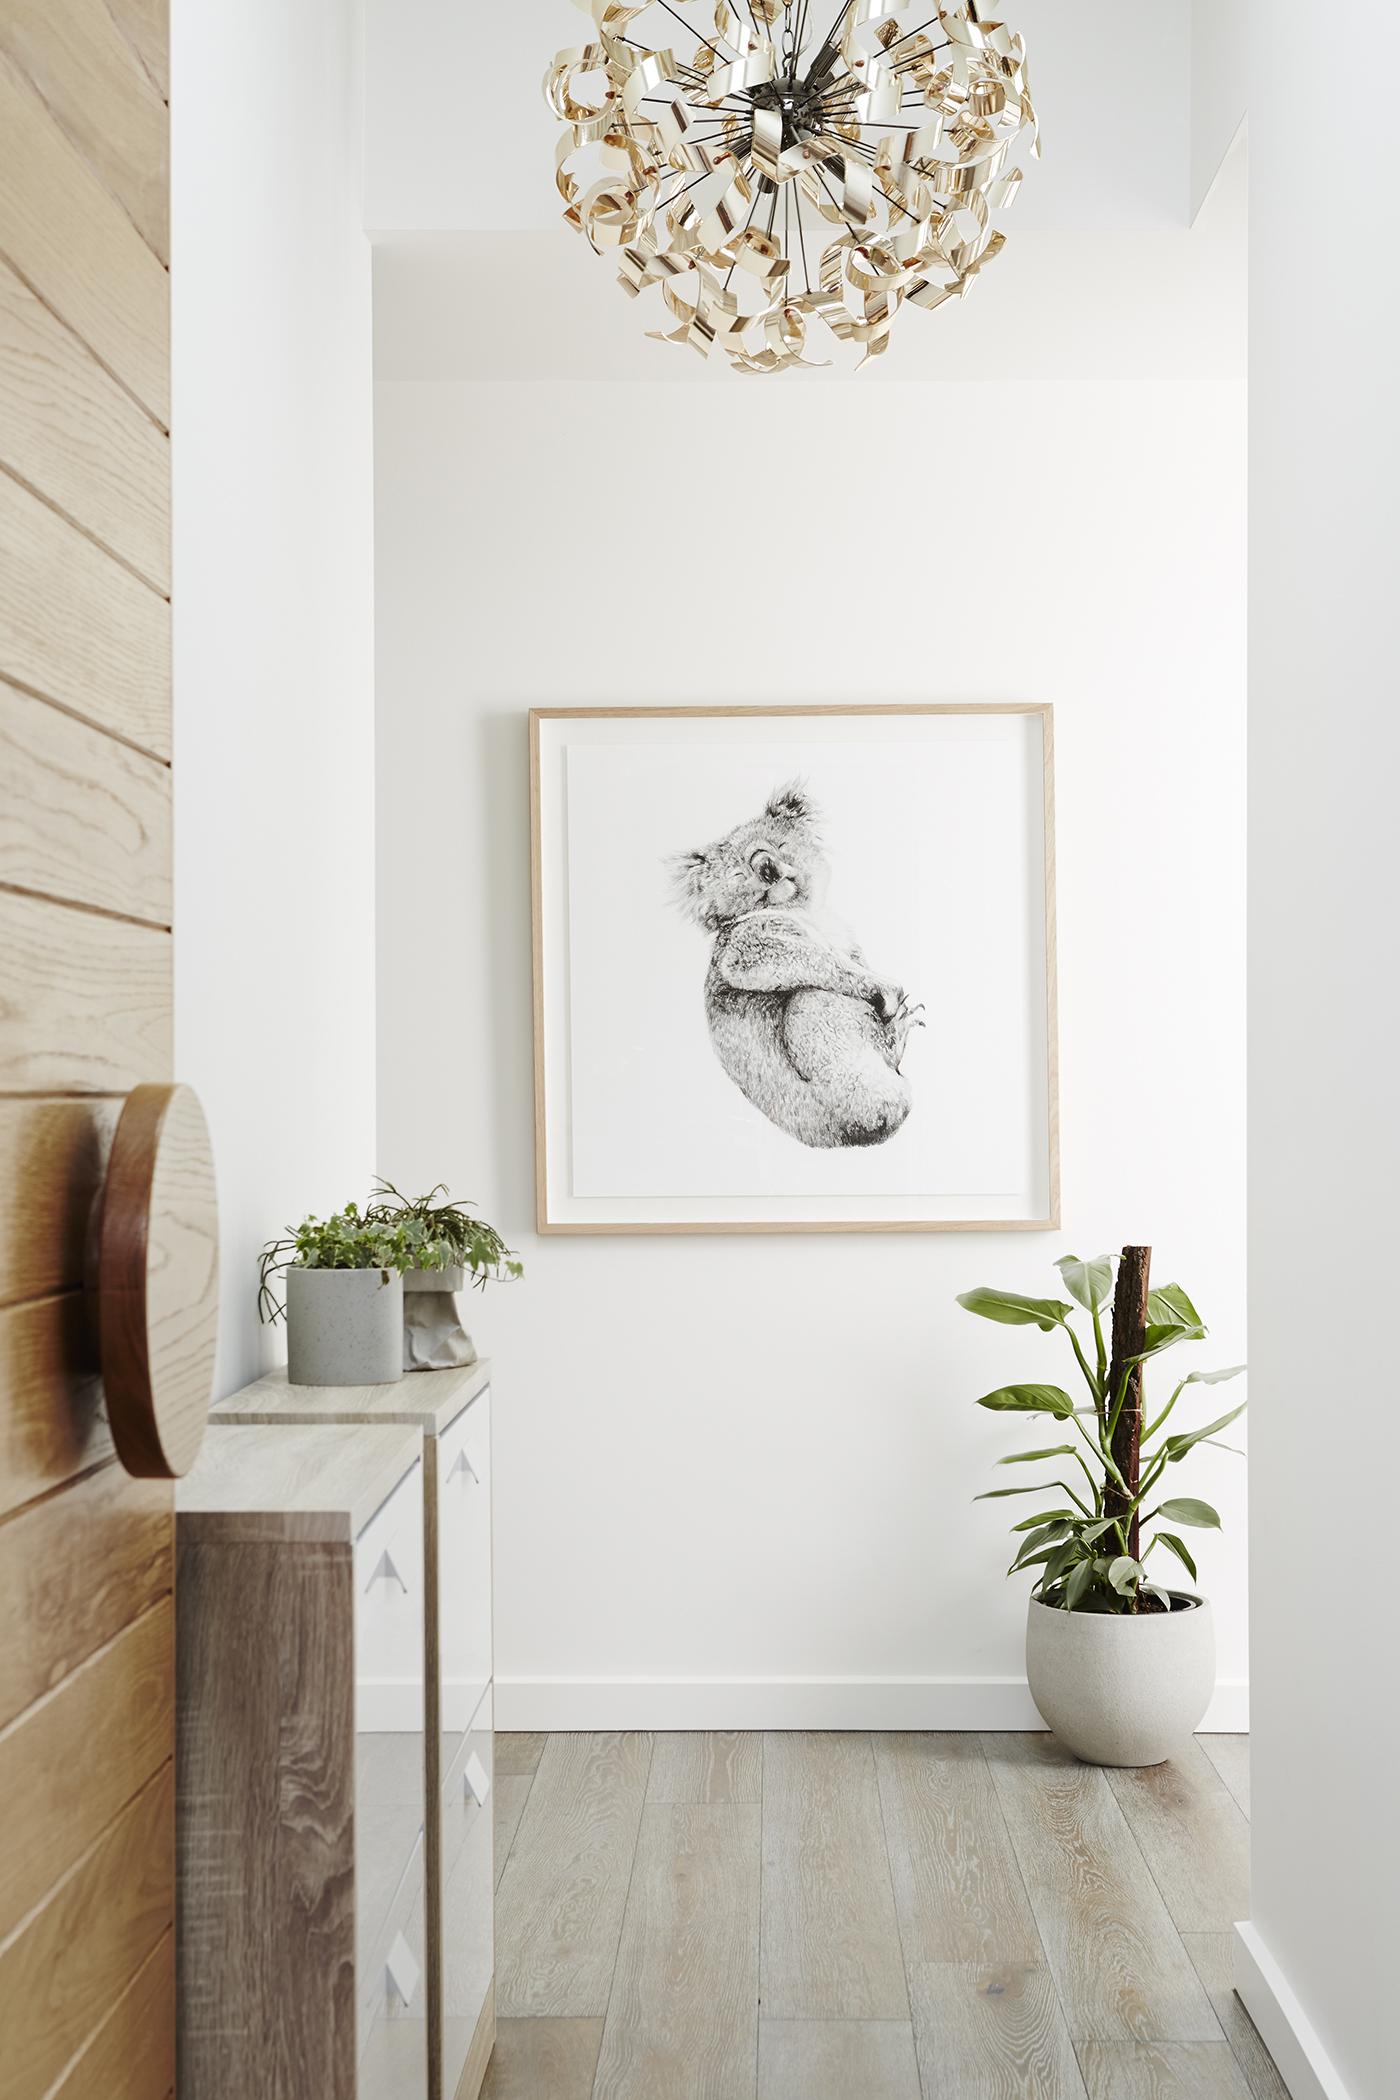 Photography:   Annette O'Brien  /  Styling:   Alana Langan  /  Interior design:   Michelle Hart, Bask Interiors